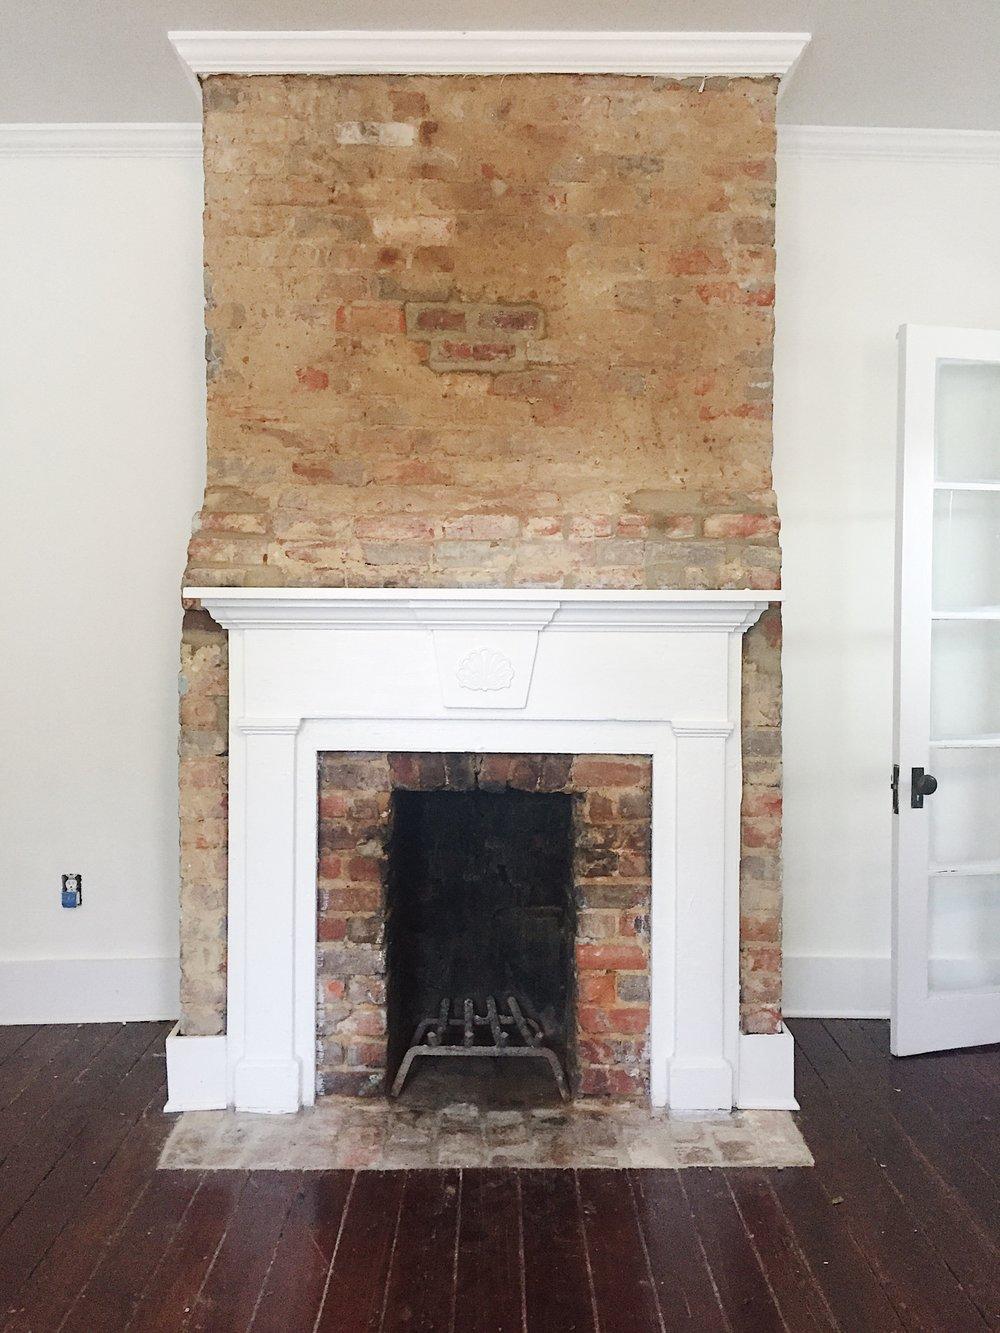 Charleston_south_carolina_exposed_fireplace_historic_home_bedroom_renovation_fireplace_mantle__.JPG